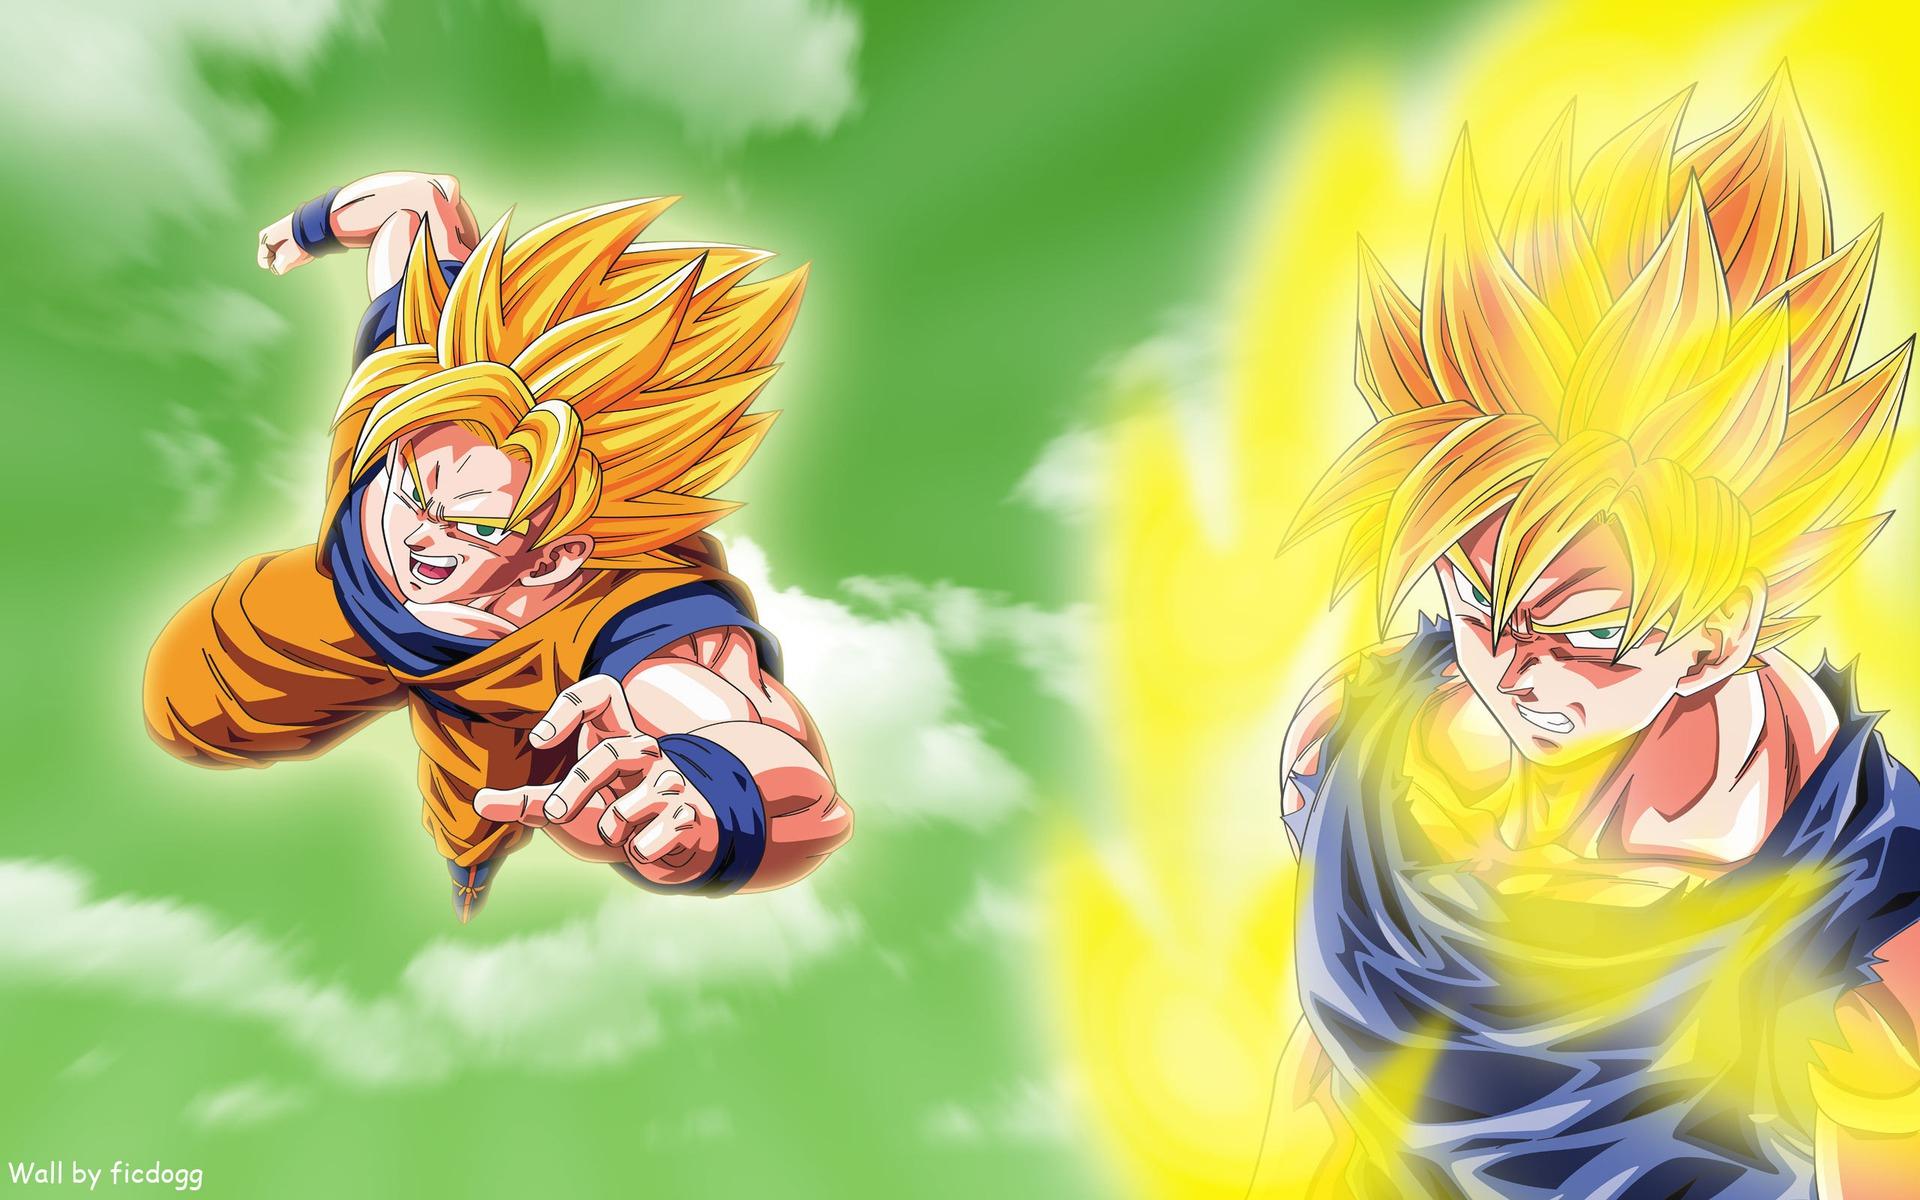 Son Goku Wallpaper 1920x1200 Son Goku Dragon Ball Z Super Saiyan 1920x1200